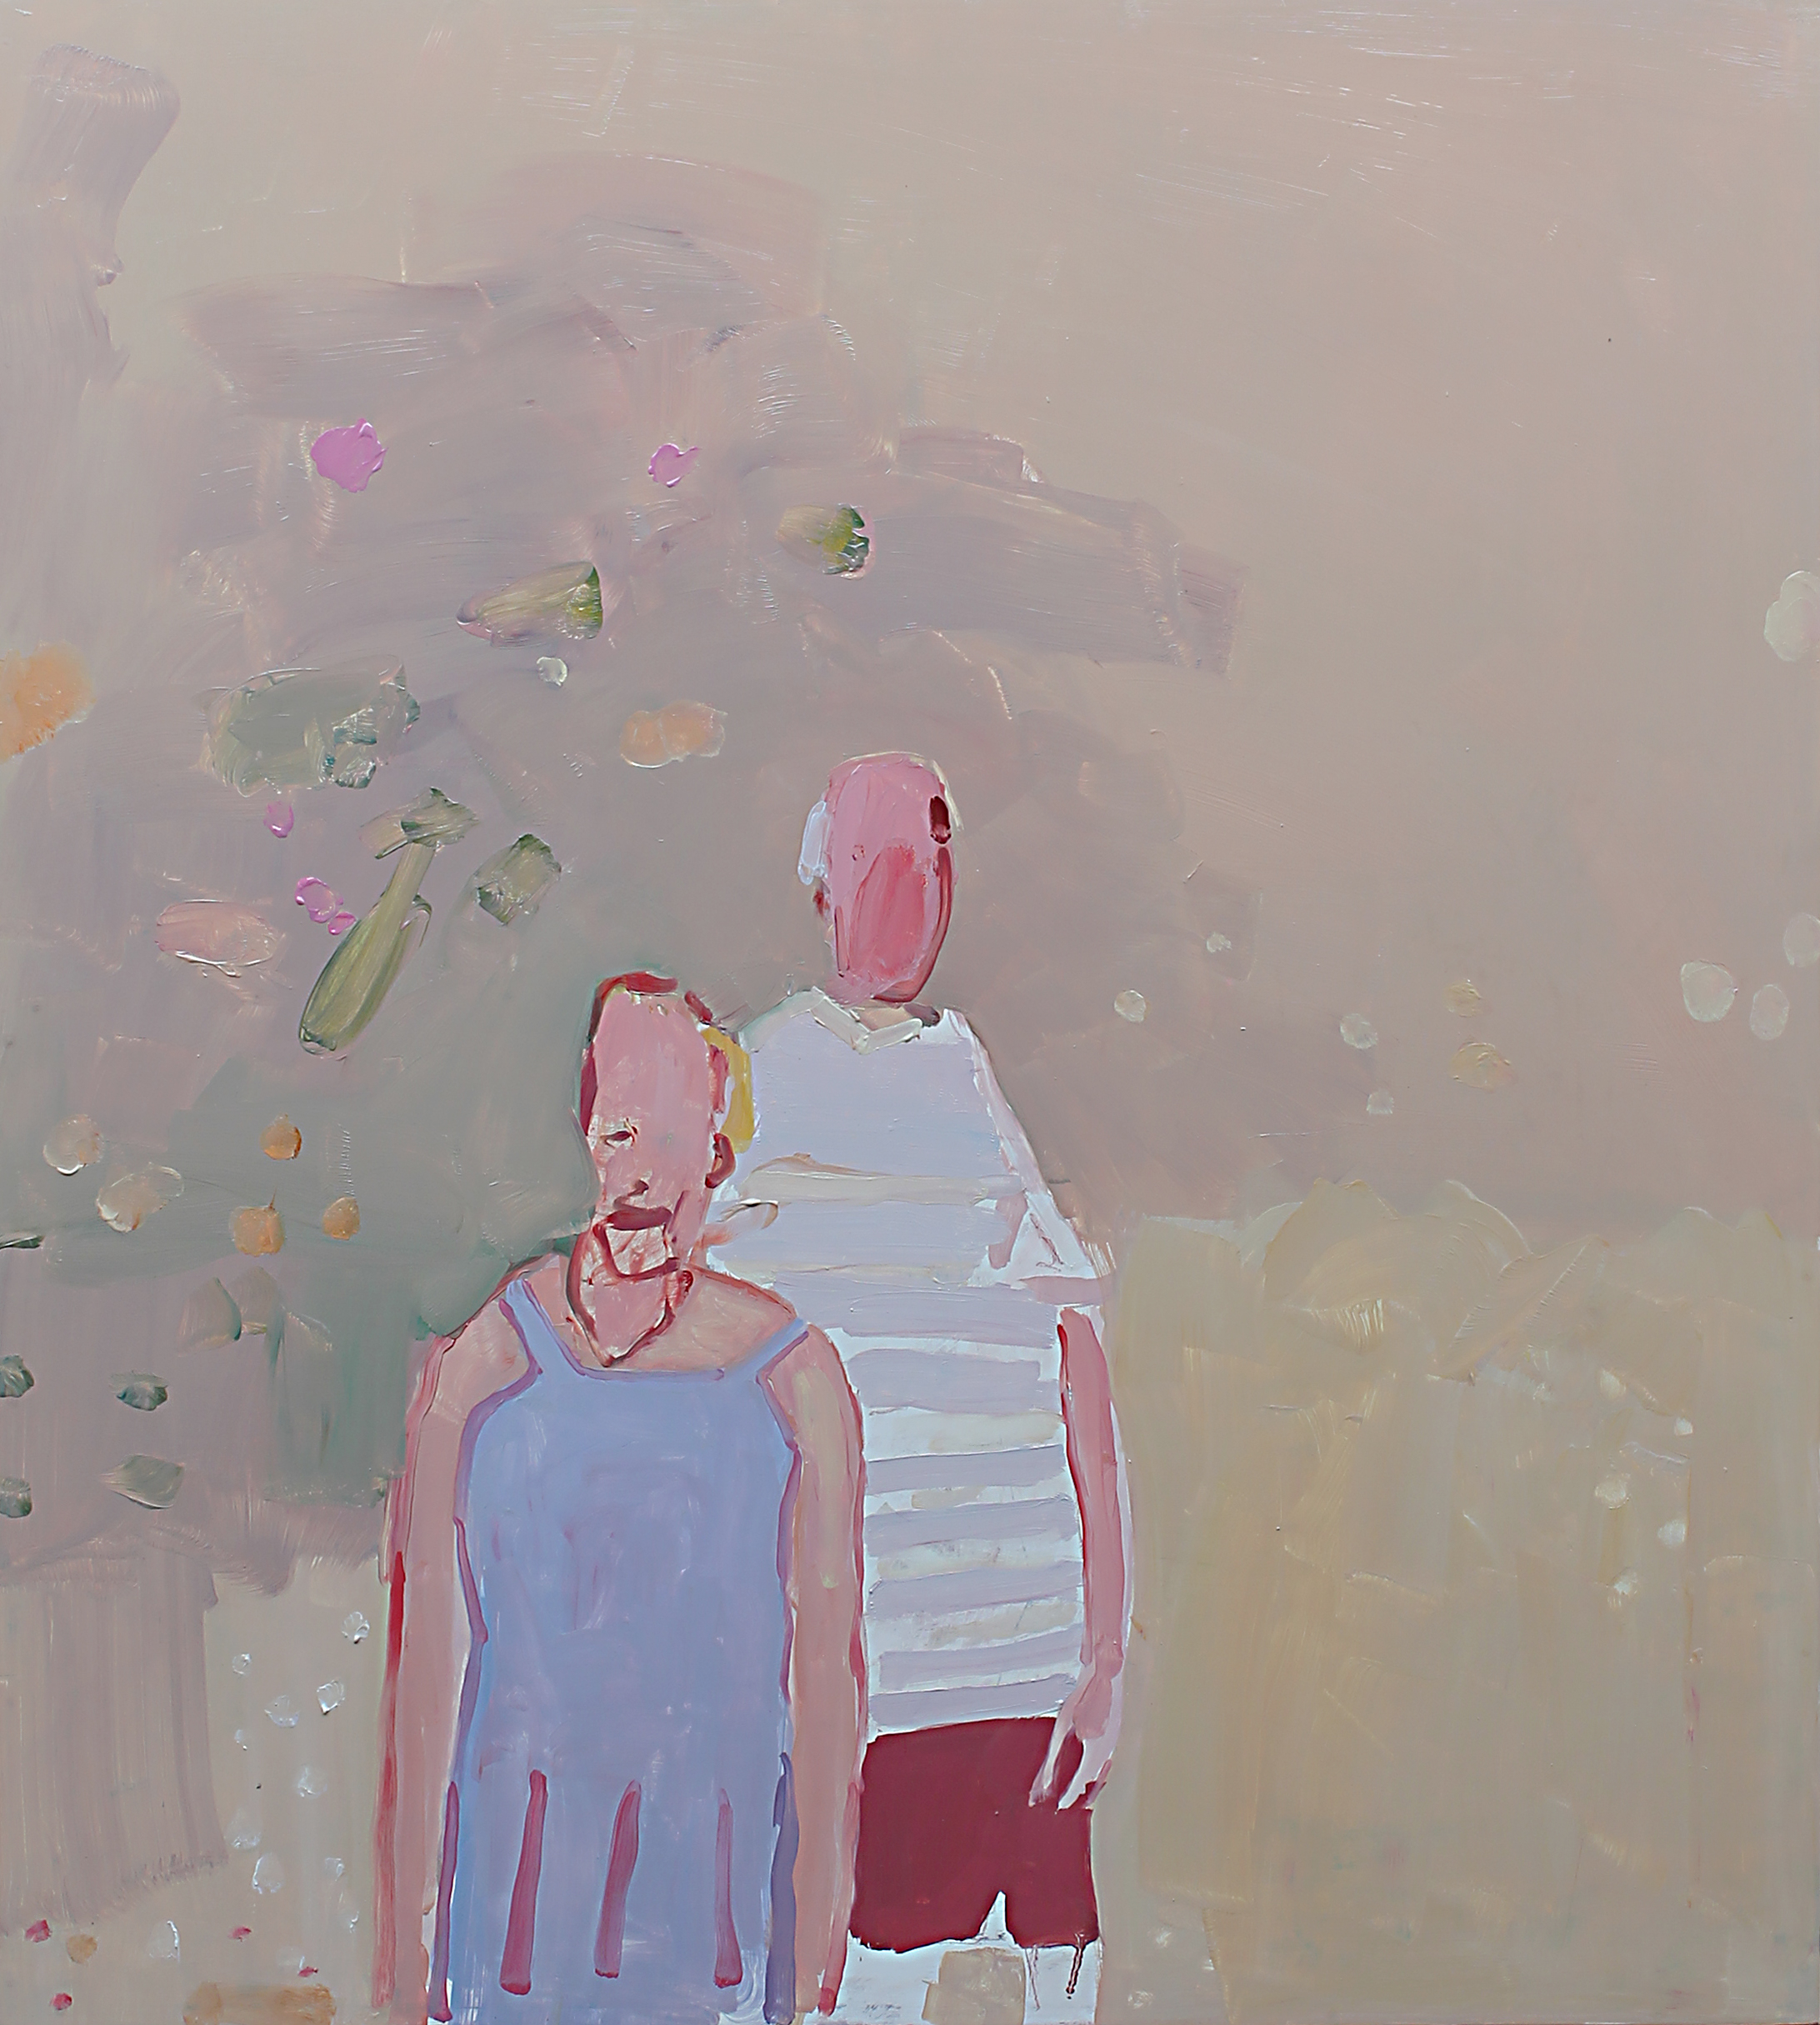 Francesco Cocco, Il giardino dei Roses, 2016, olio su tela, 90 x 80 cm